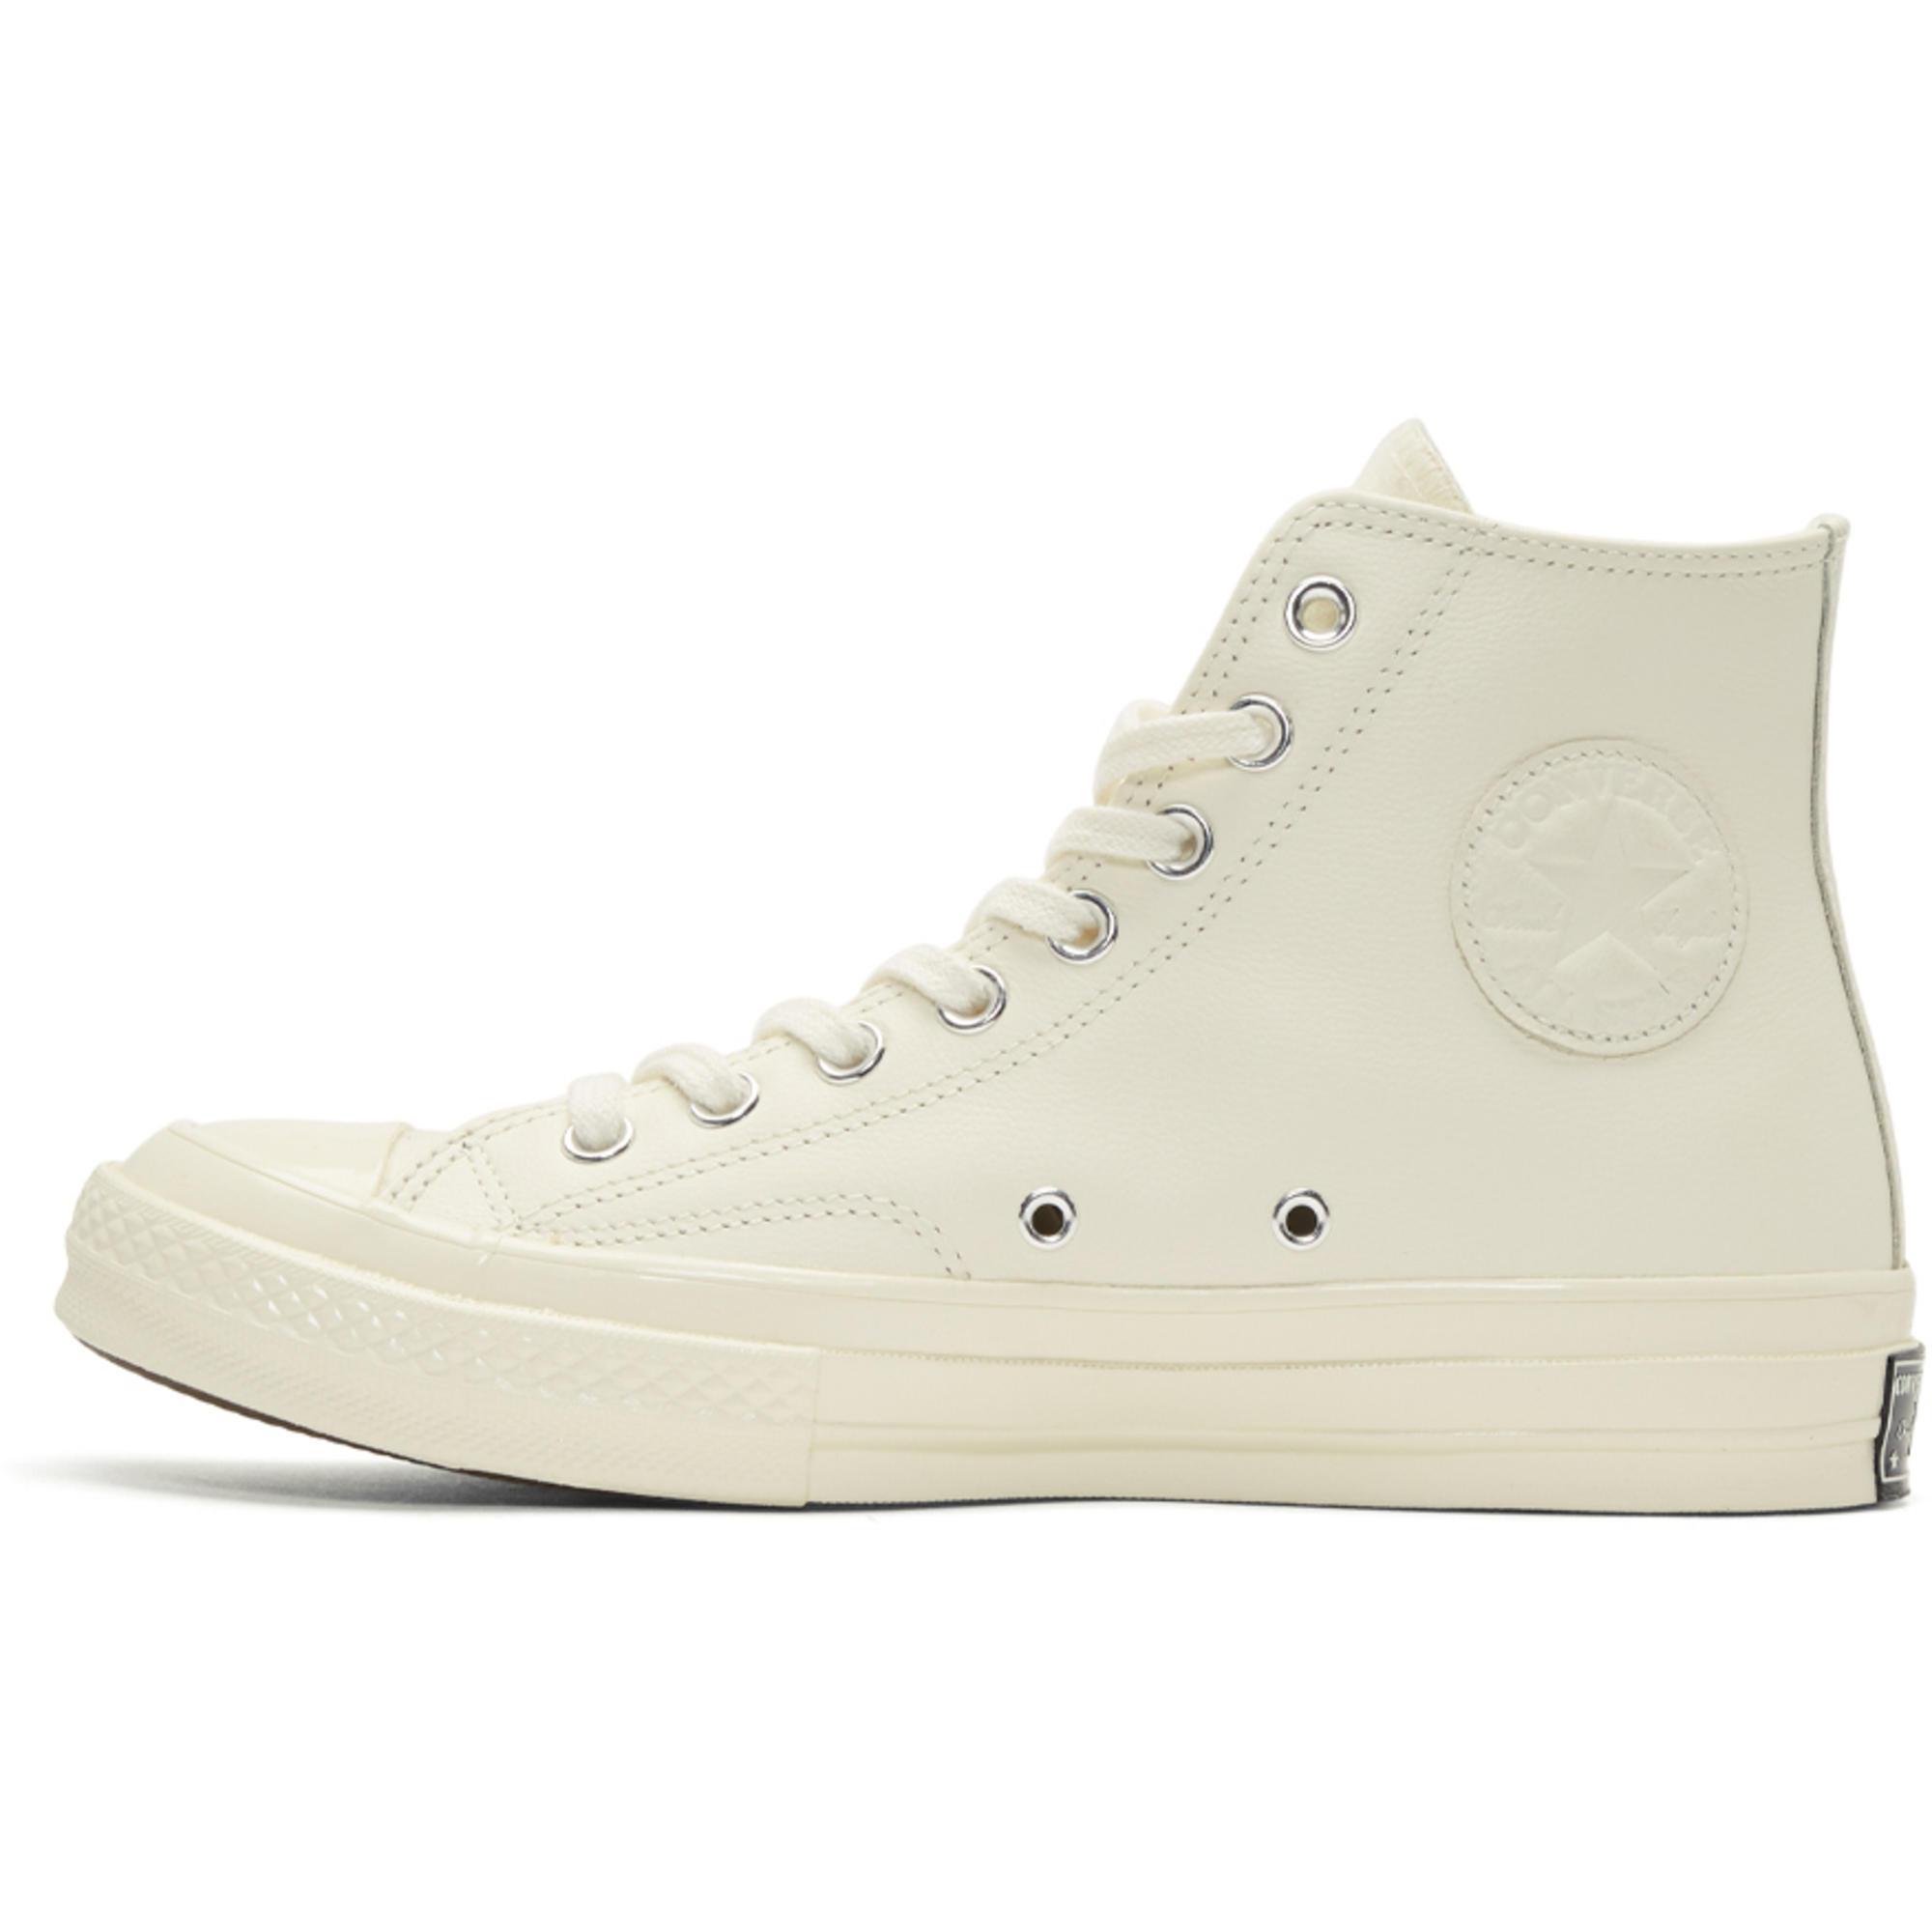 Baskets blanches Wordmark Wool Chuck 70 High Converse pour homme en coloris White